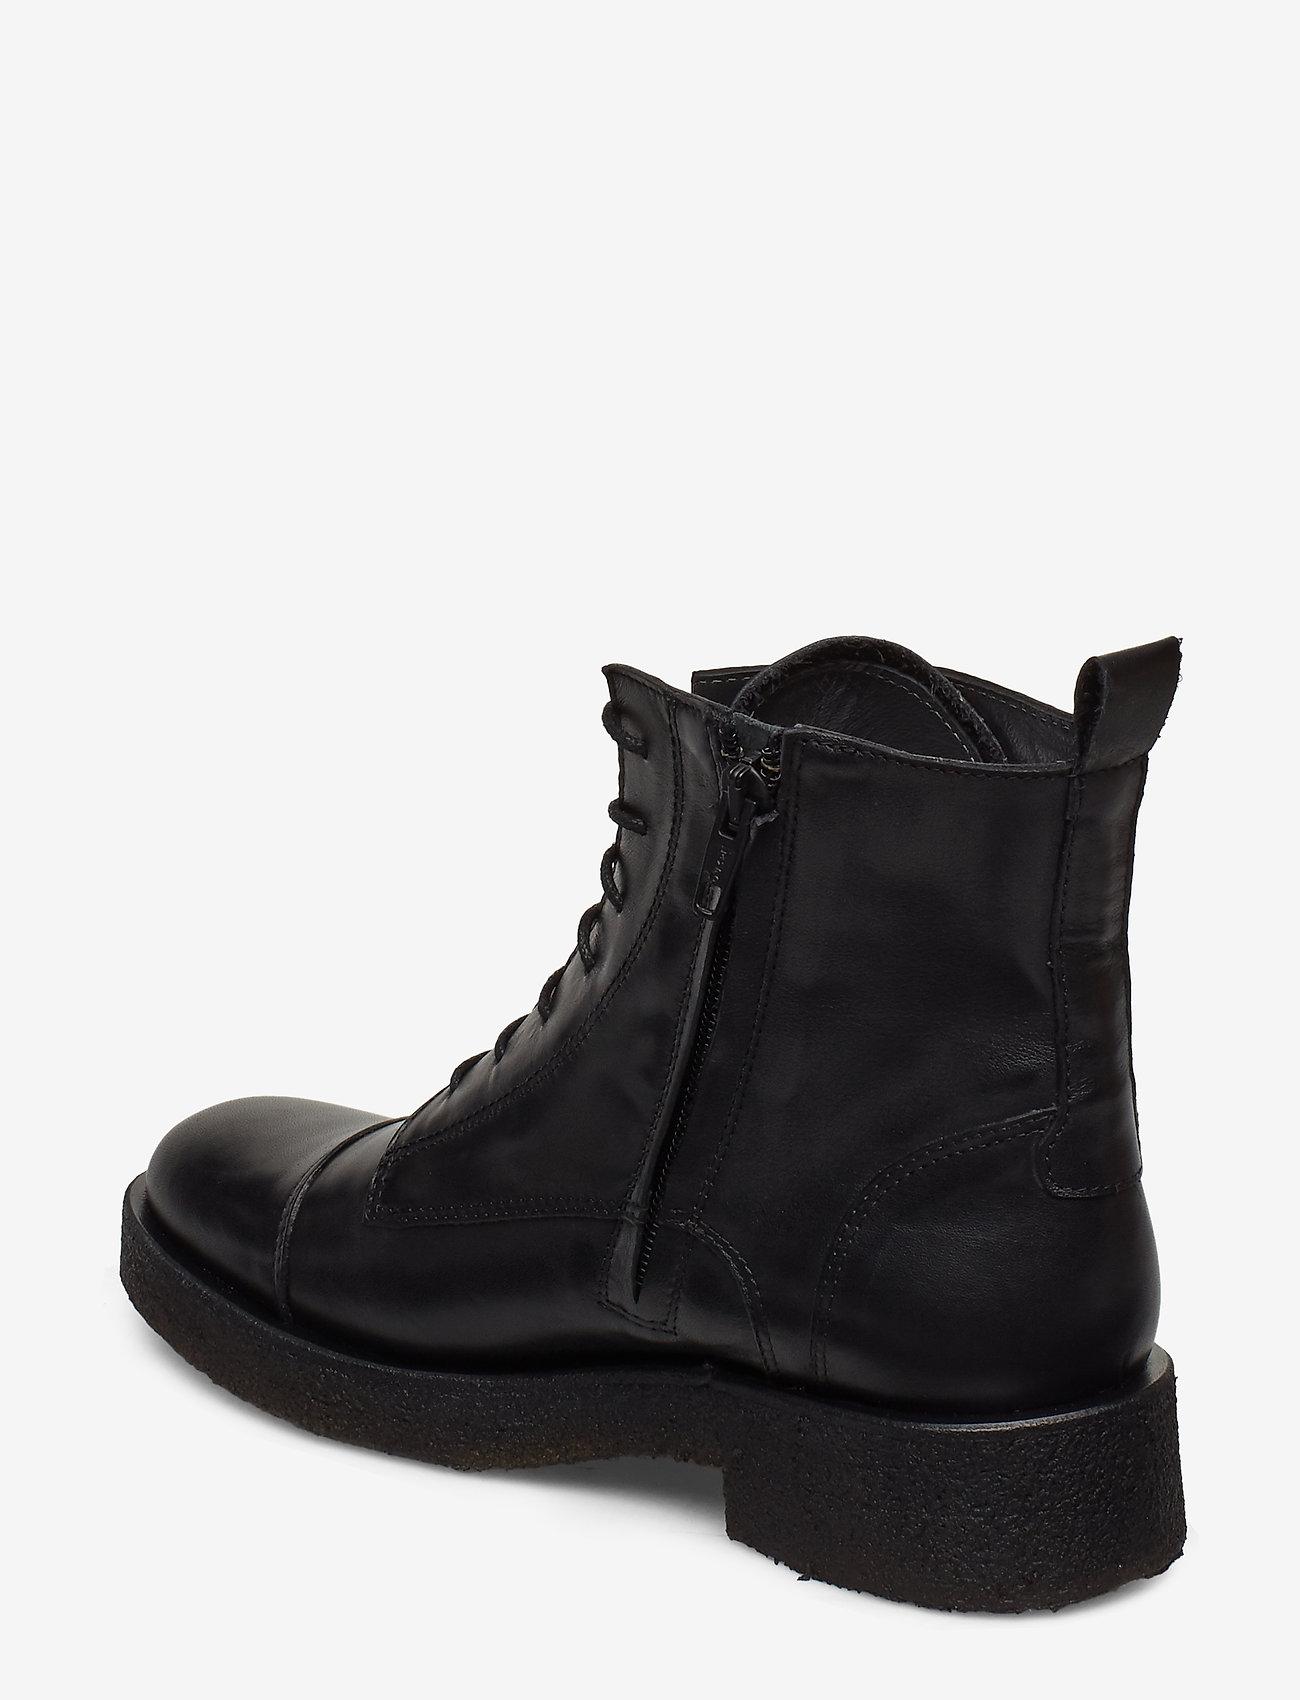 Booties - Flat (1604 Black) - ANGULUS